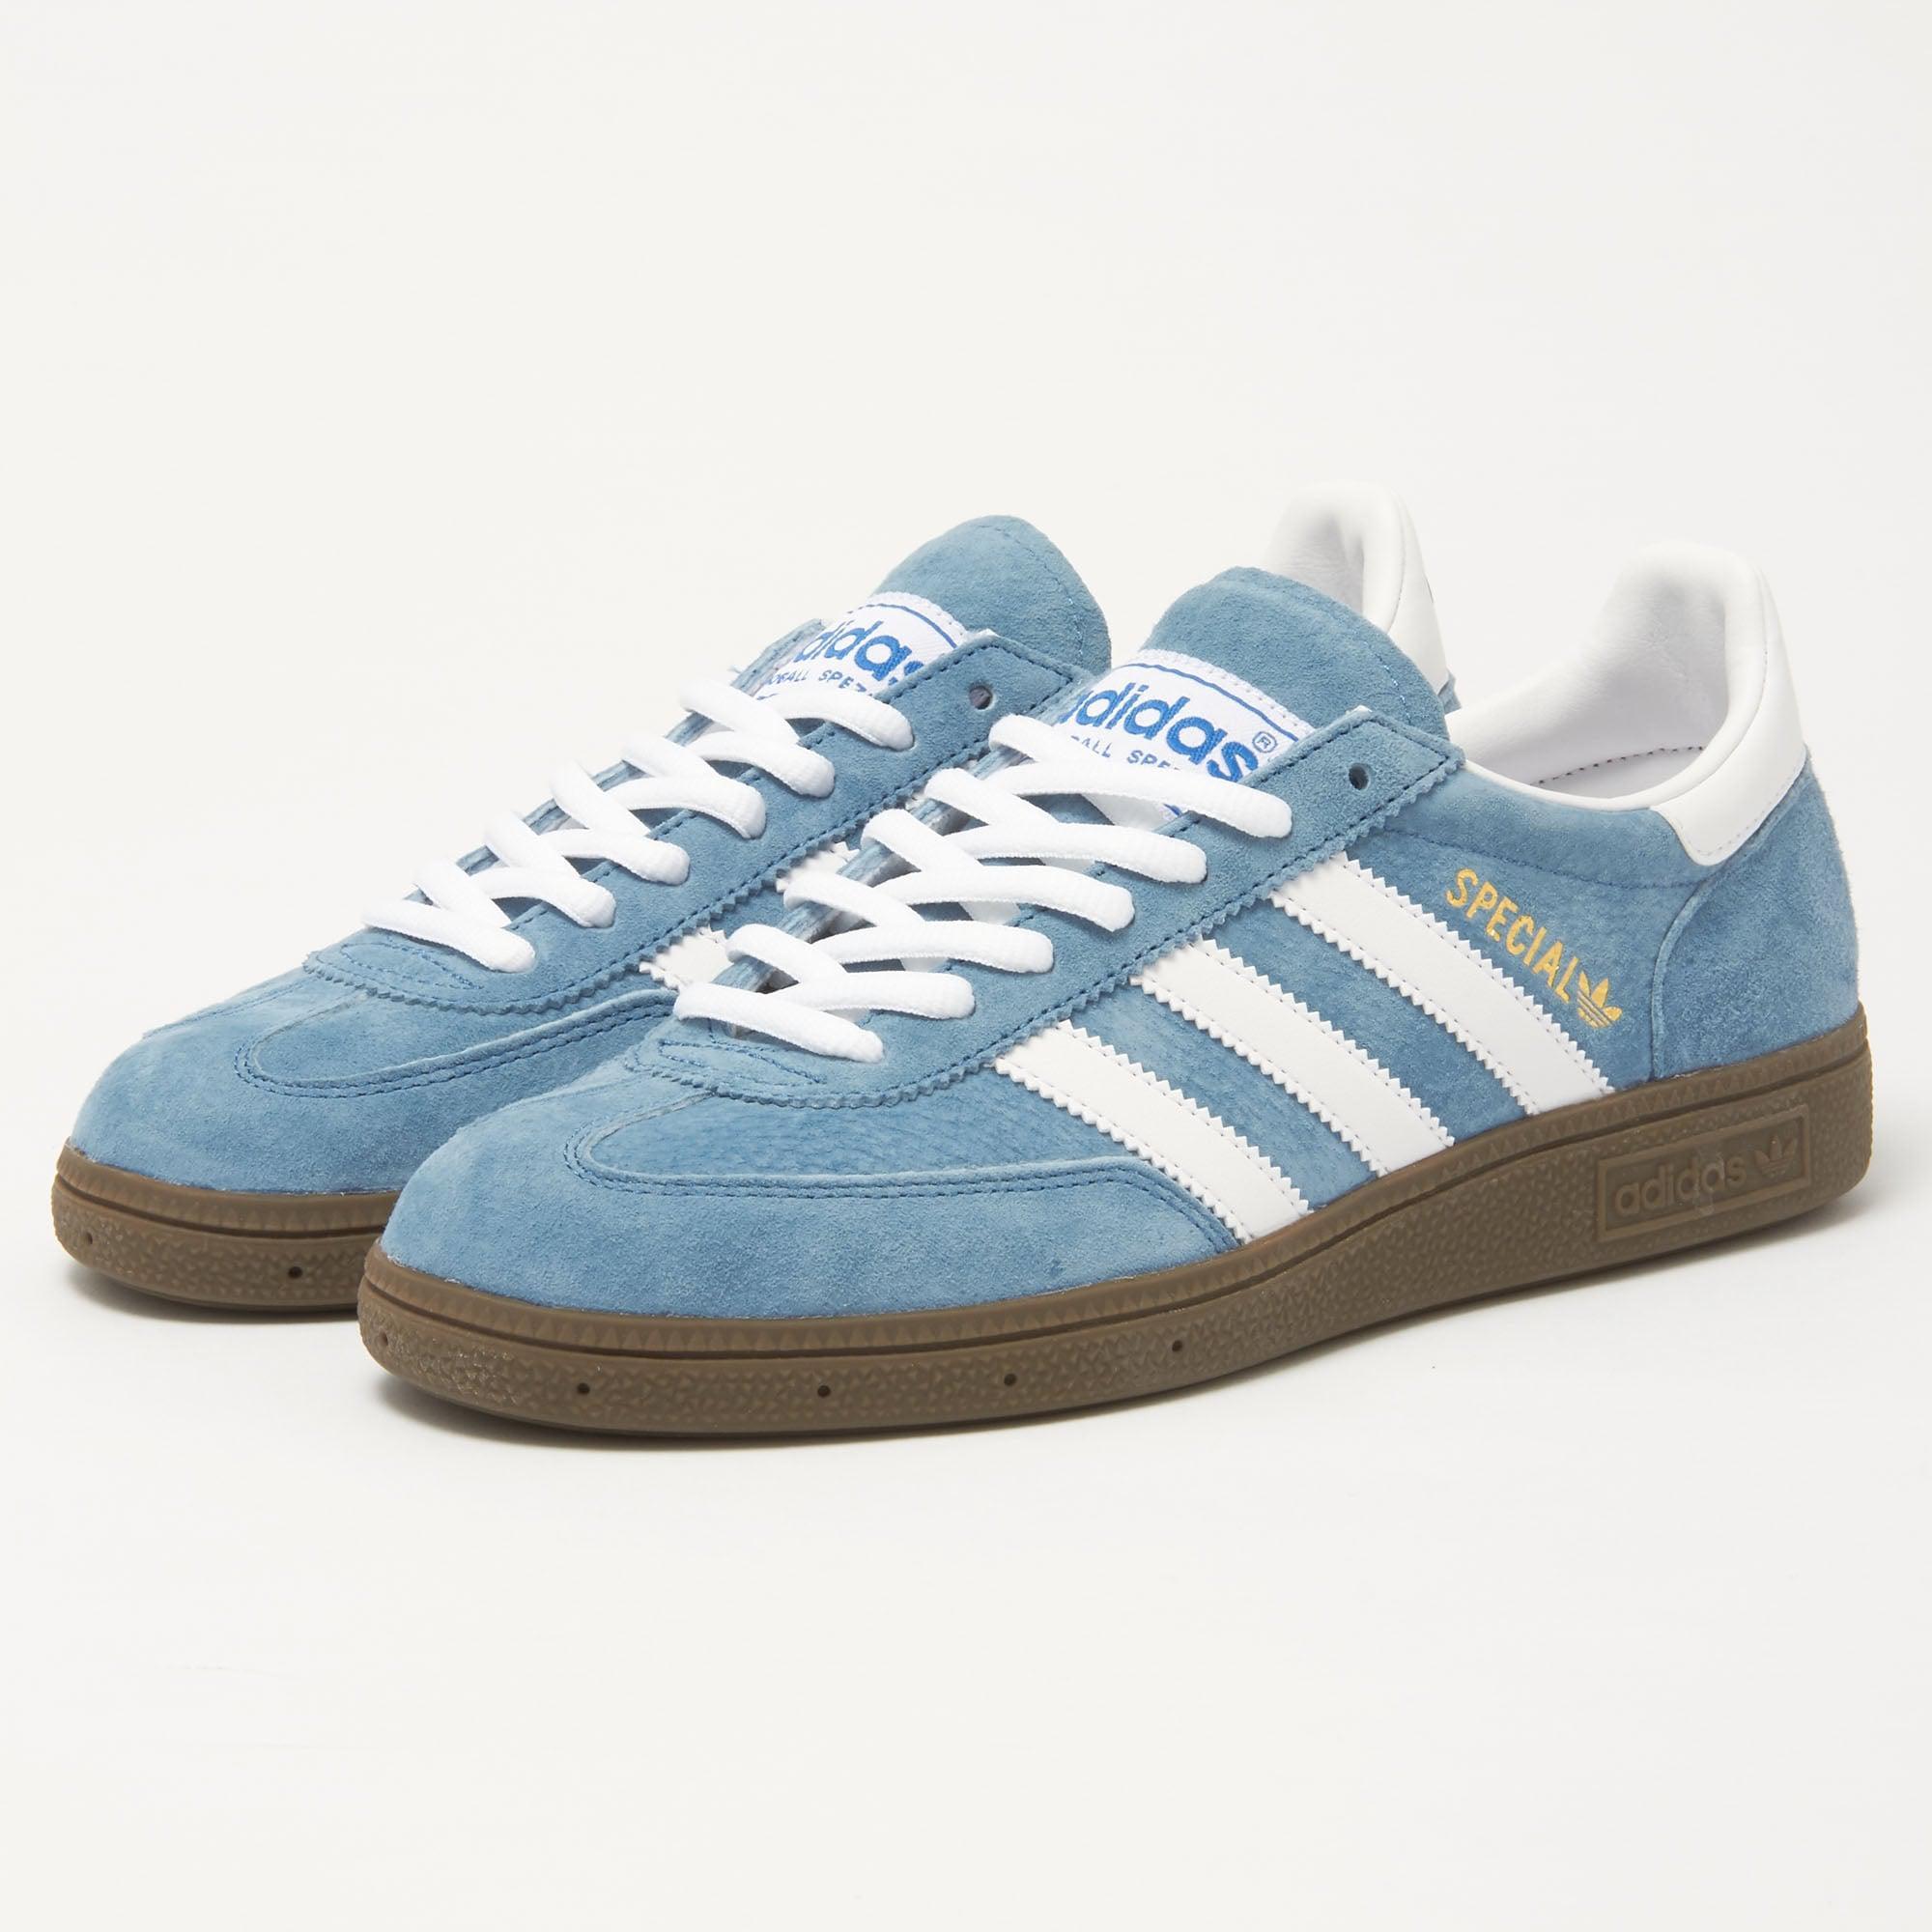 Adidas Handball Spezial Blue Sneaker